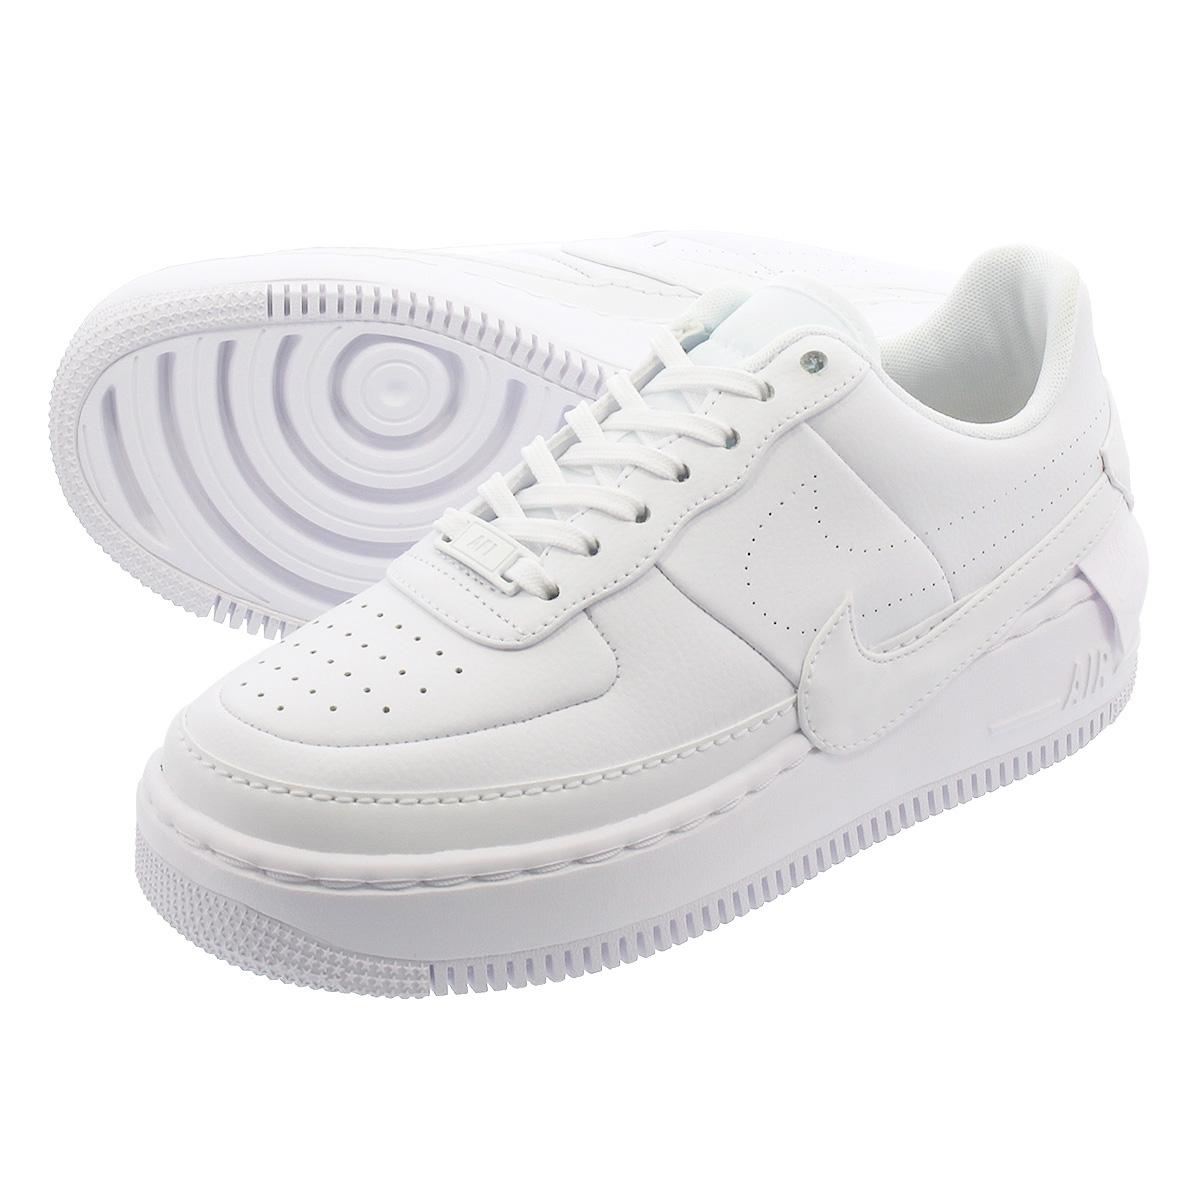 Nike WMNS Air Force 1 Jester XX Triple White black AO1220 101